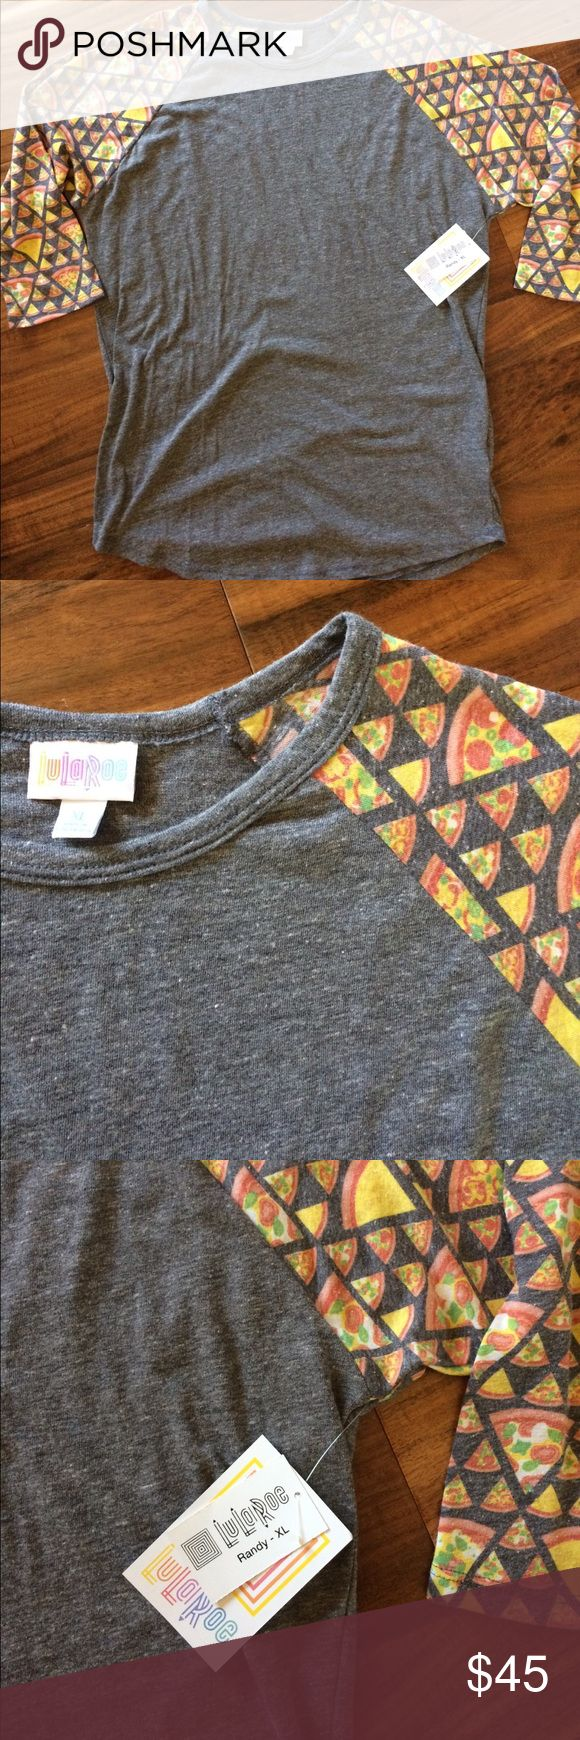 LuLaRoe Randy XL pizza!!! LuLaRoe Randy tee in size XL. Heathered grey body with pizza design on the sleeves!!! New with tags! Unicorn alert!!! LuLaRoe Tops Tees - Long Sleeve